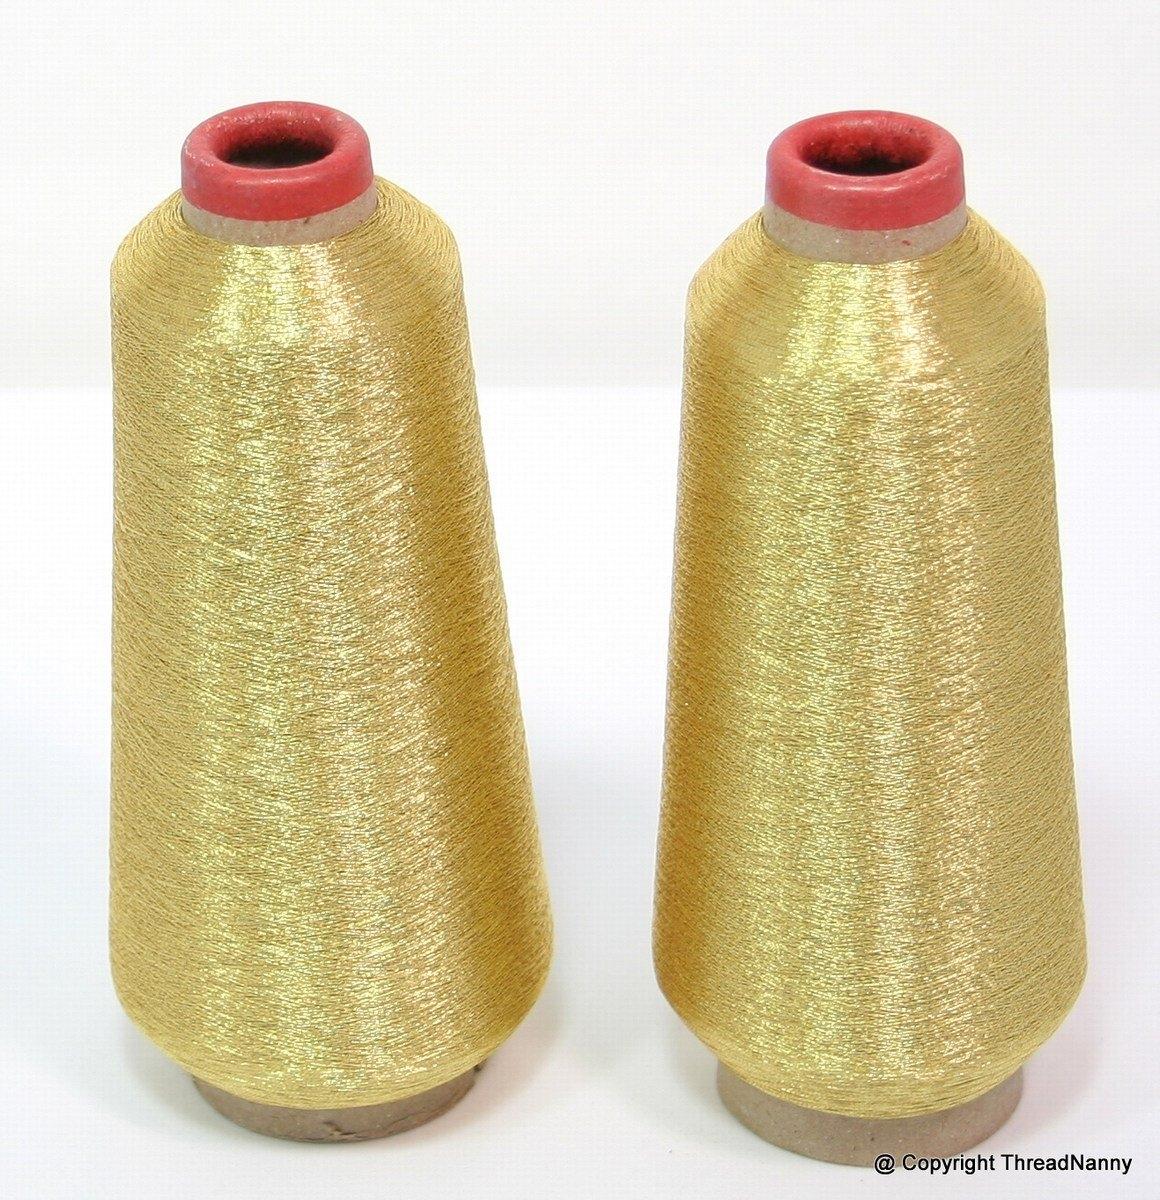 Gold Metallic Embroidery Thread Spools From Threadnanny